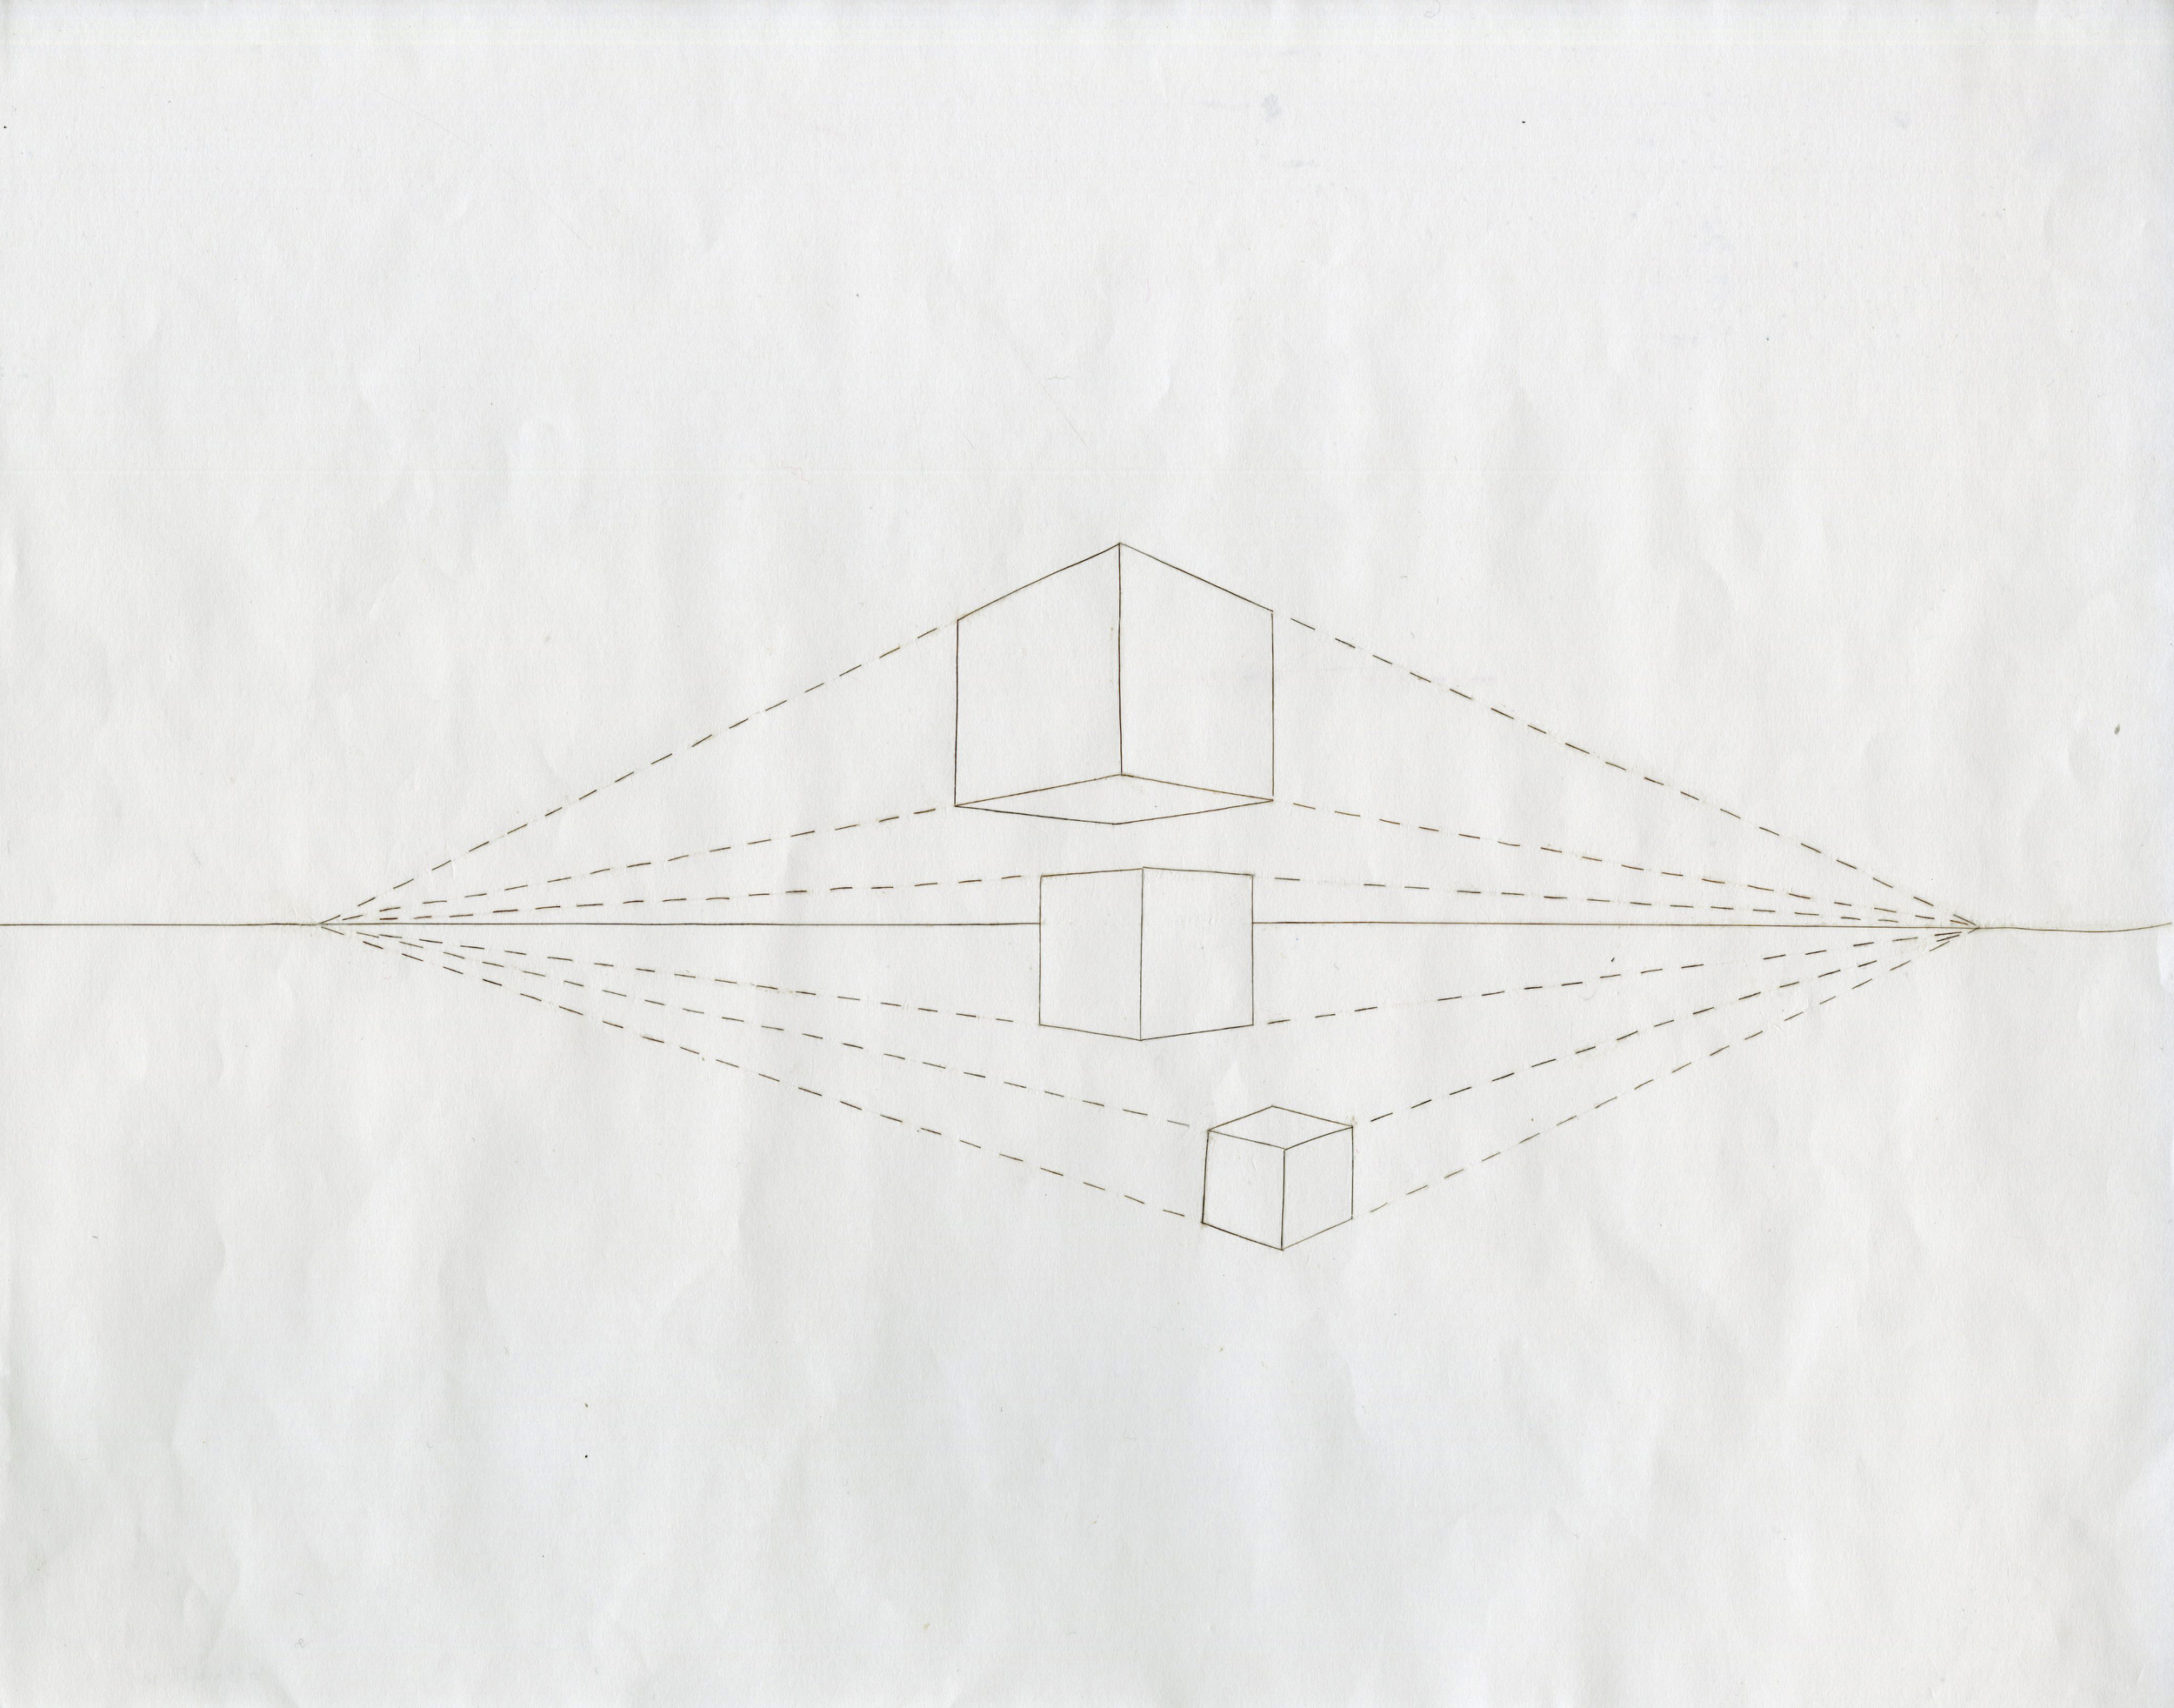 img021 (1).jpg